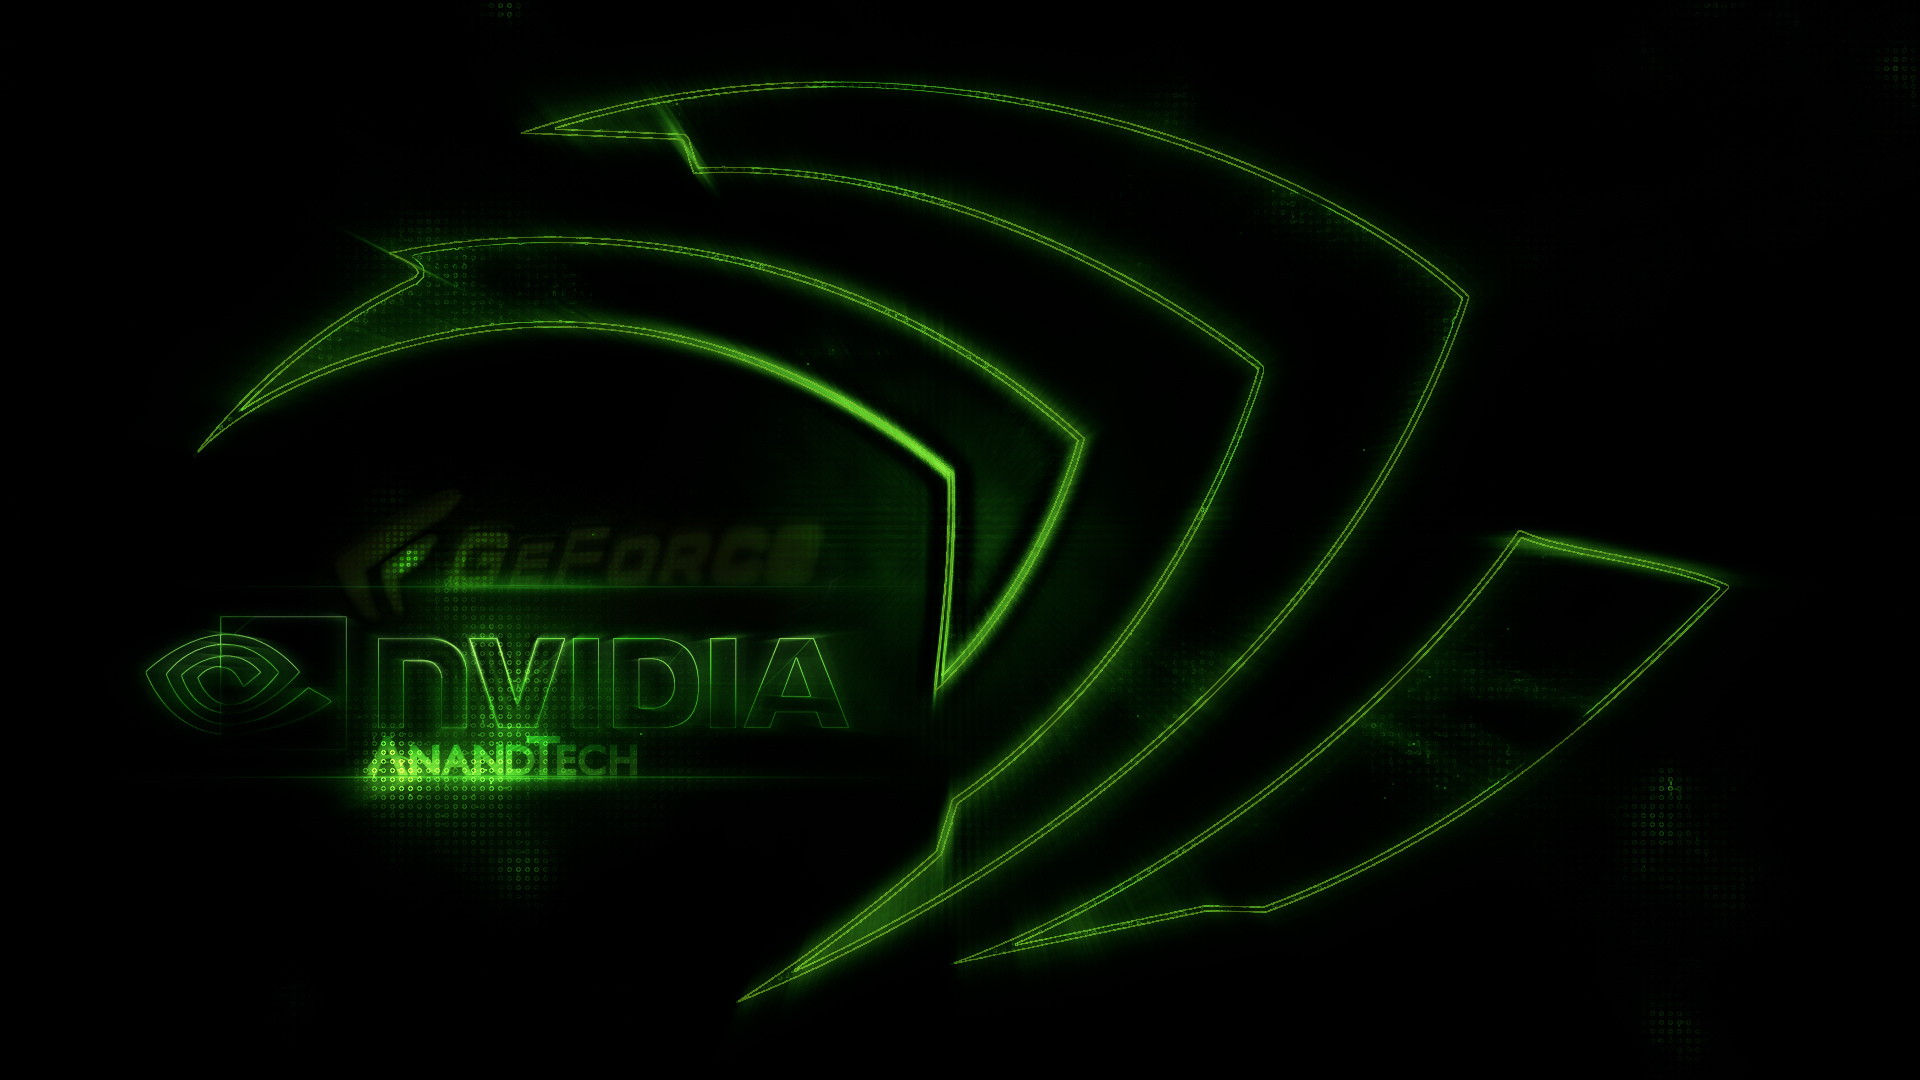 HD Win 8.1 AMD Wallpaper - WallpaperSafari